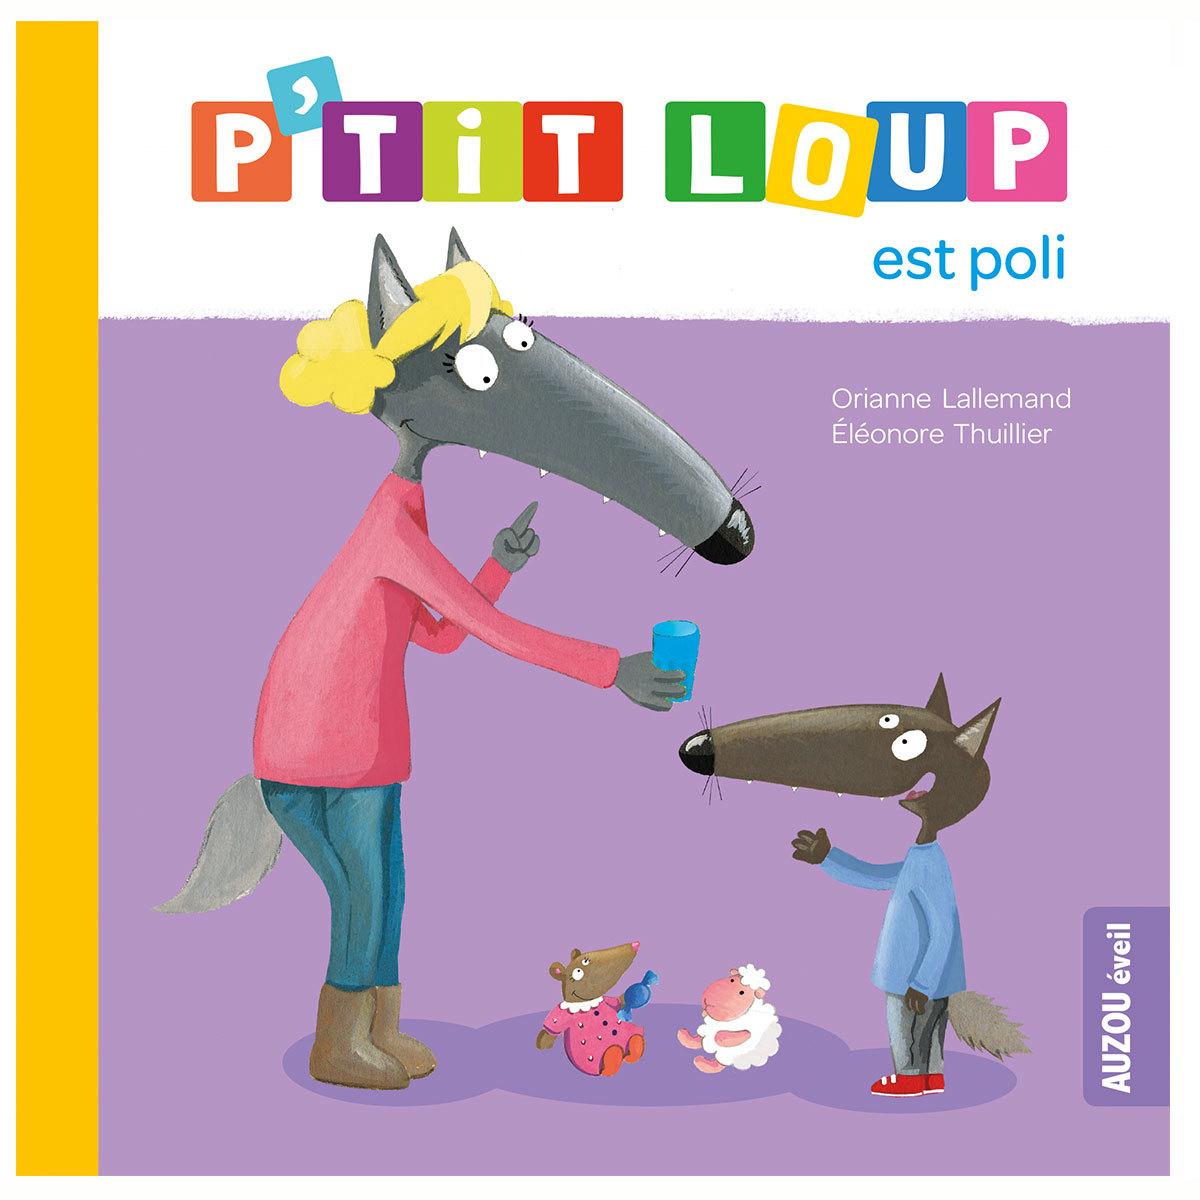 Livre & Carte P'tit Loup est poli P'tit Loup est poli